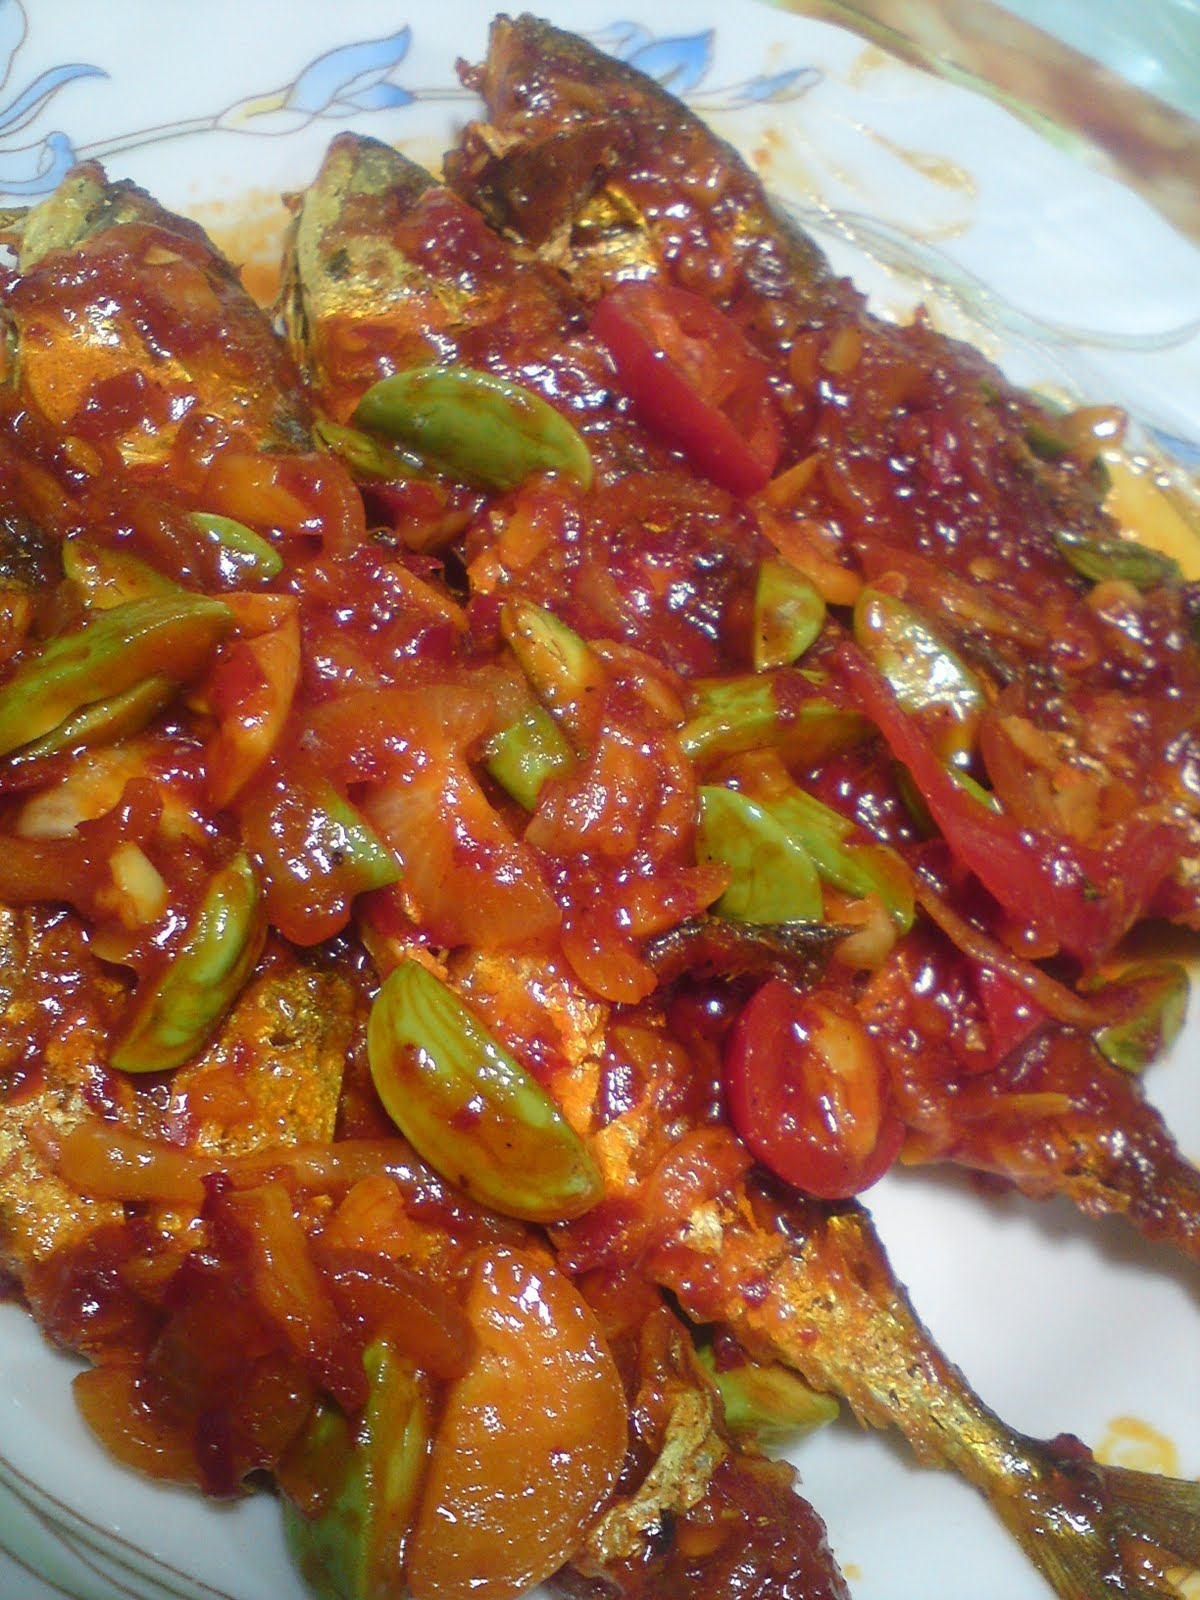 LoVe WiTHiN uS: Ikan masak sambal petai